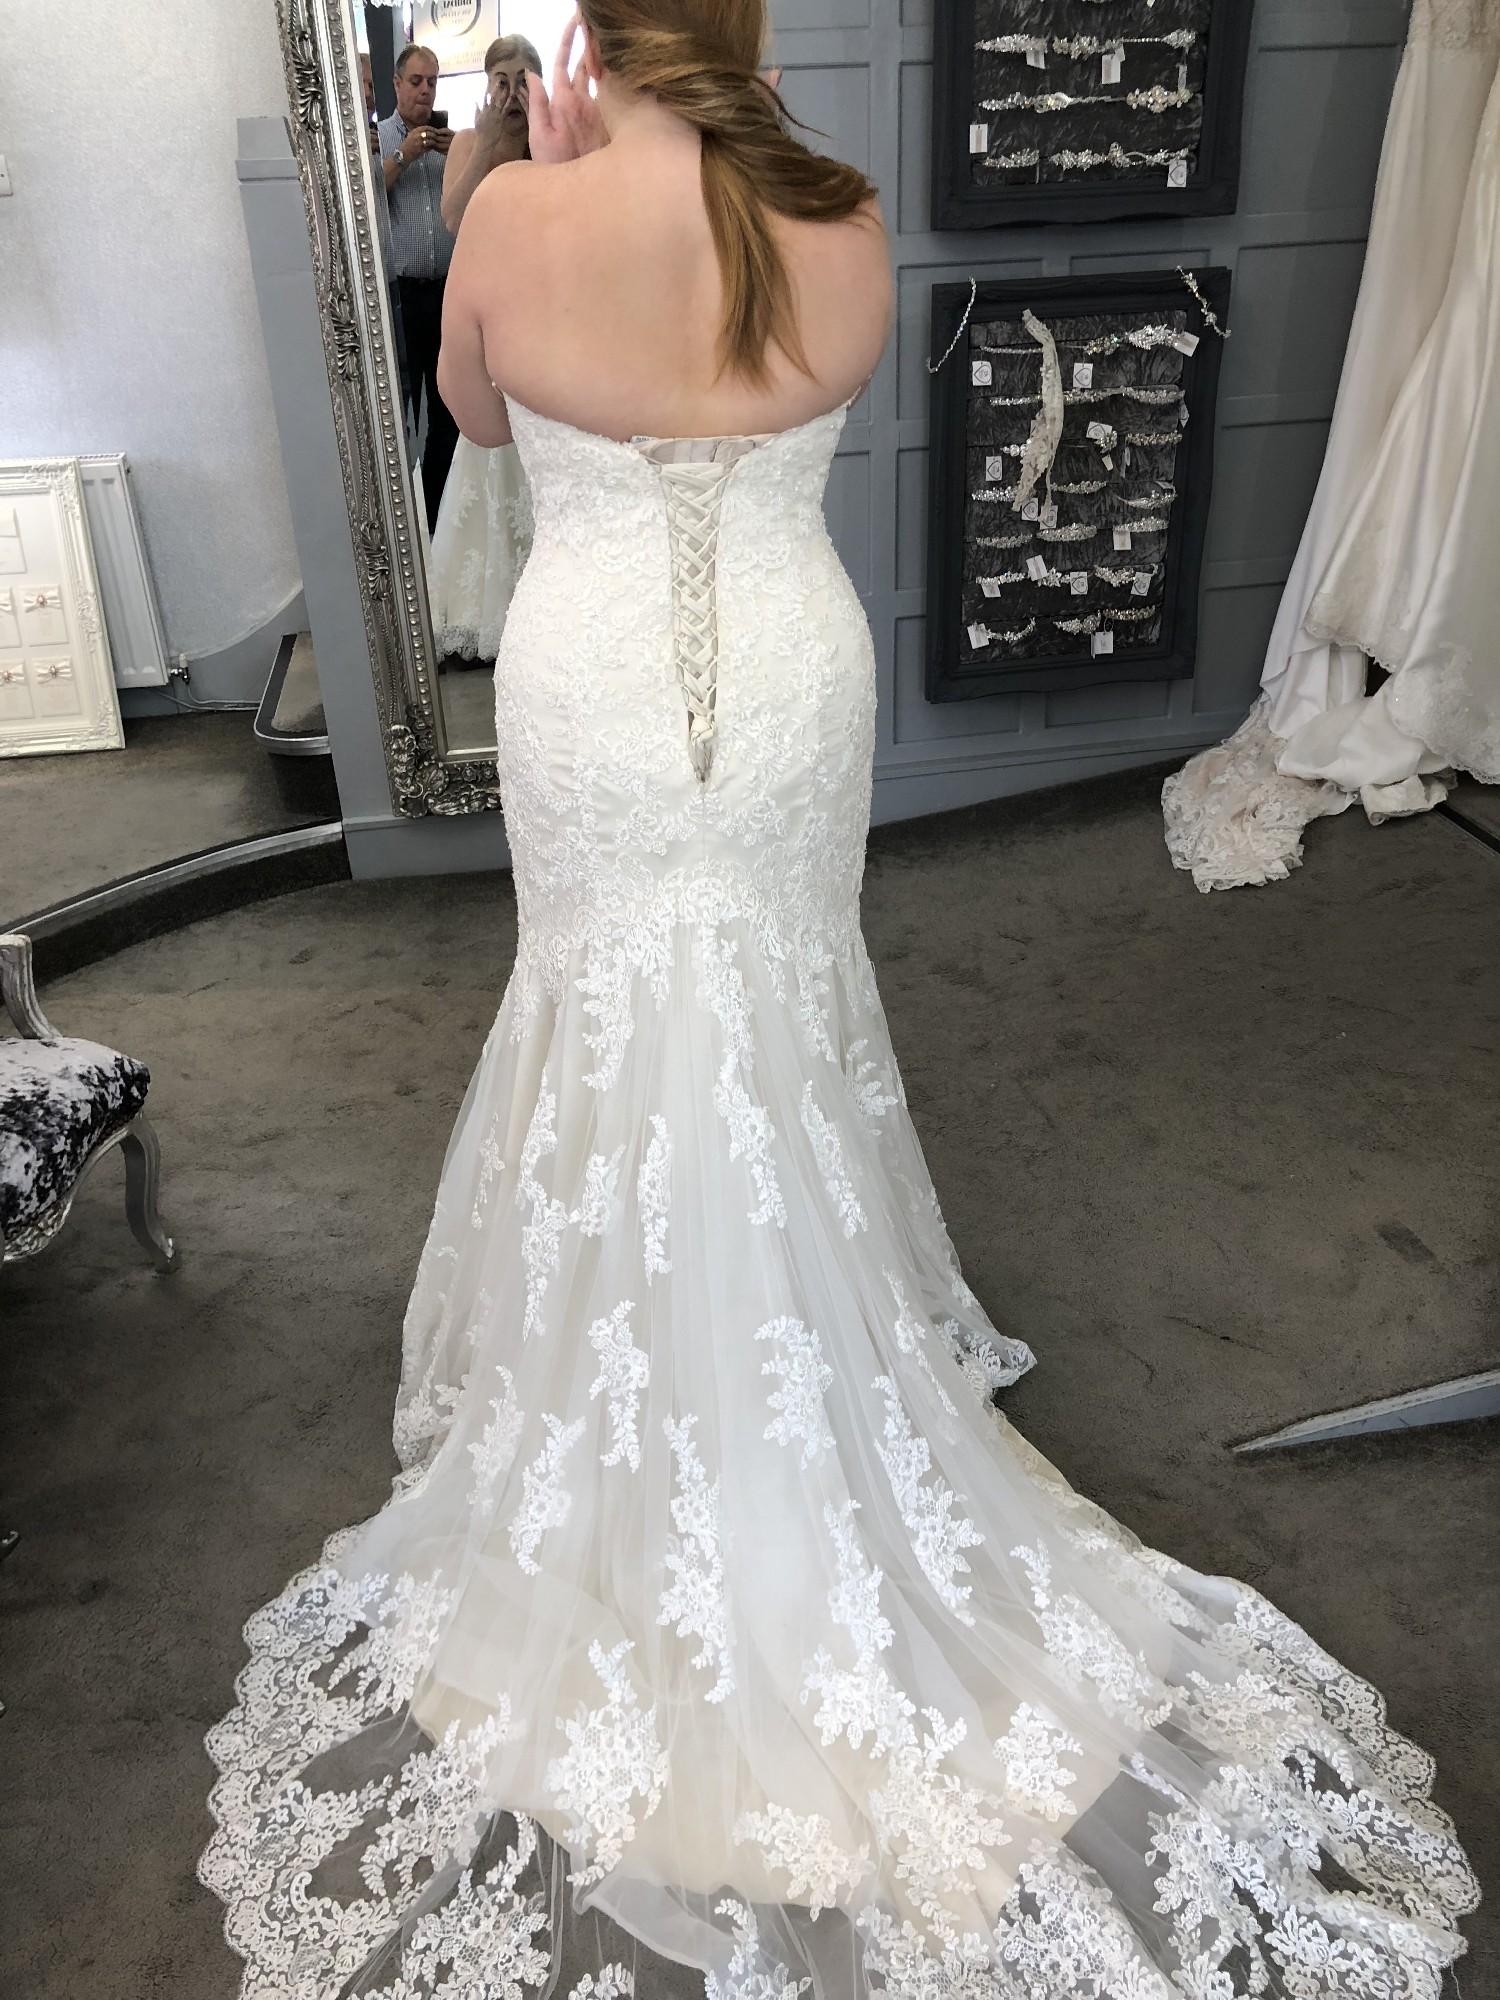 Maggie Sottero 6ss774lu Ivory Over Light Gold New Wedding Dress Save 47 Stillwhite